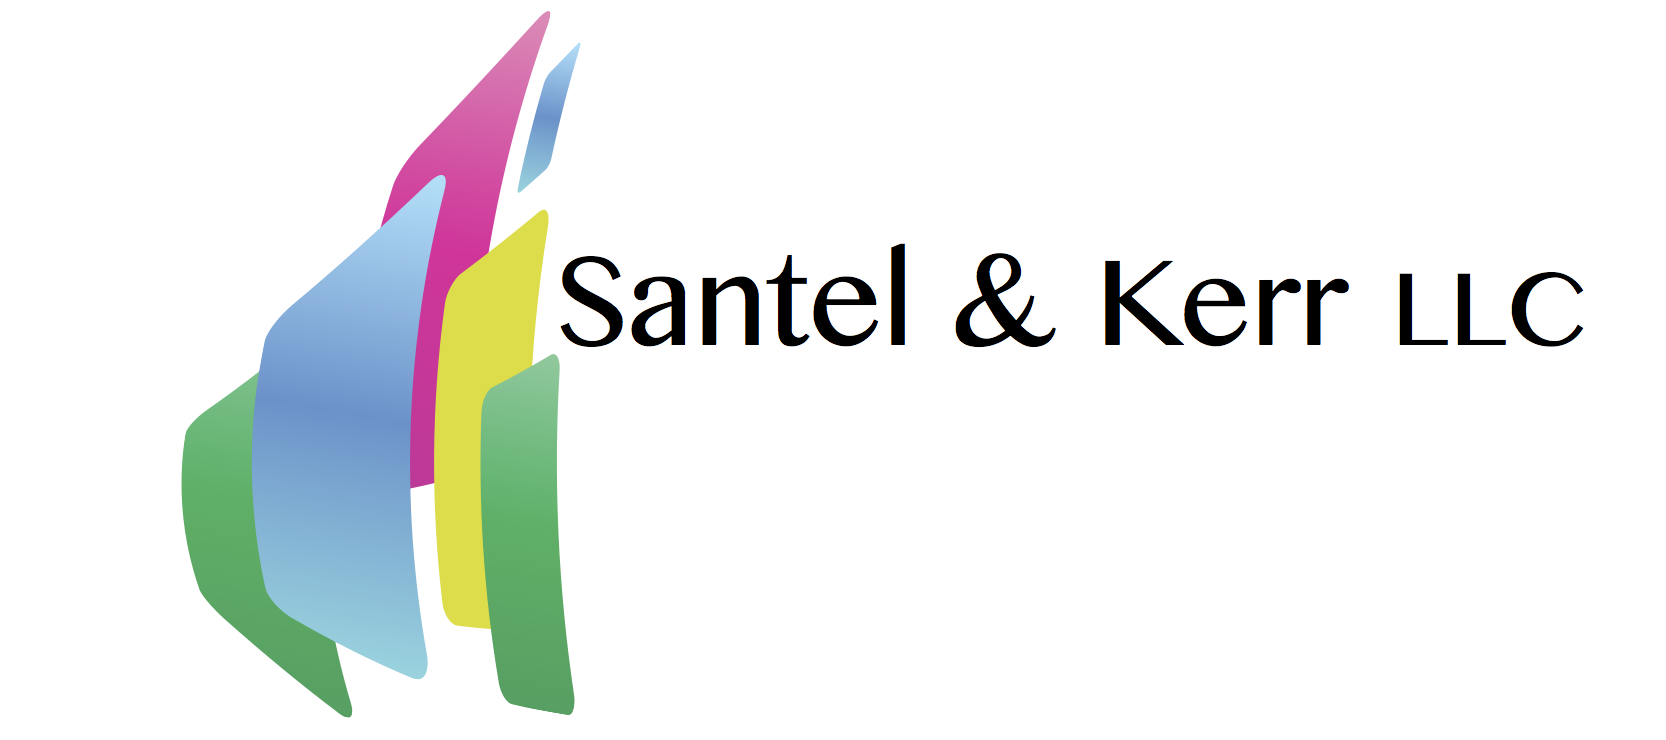 Santel & Kerr